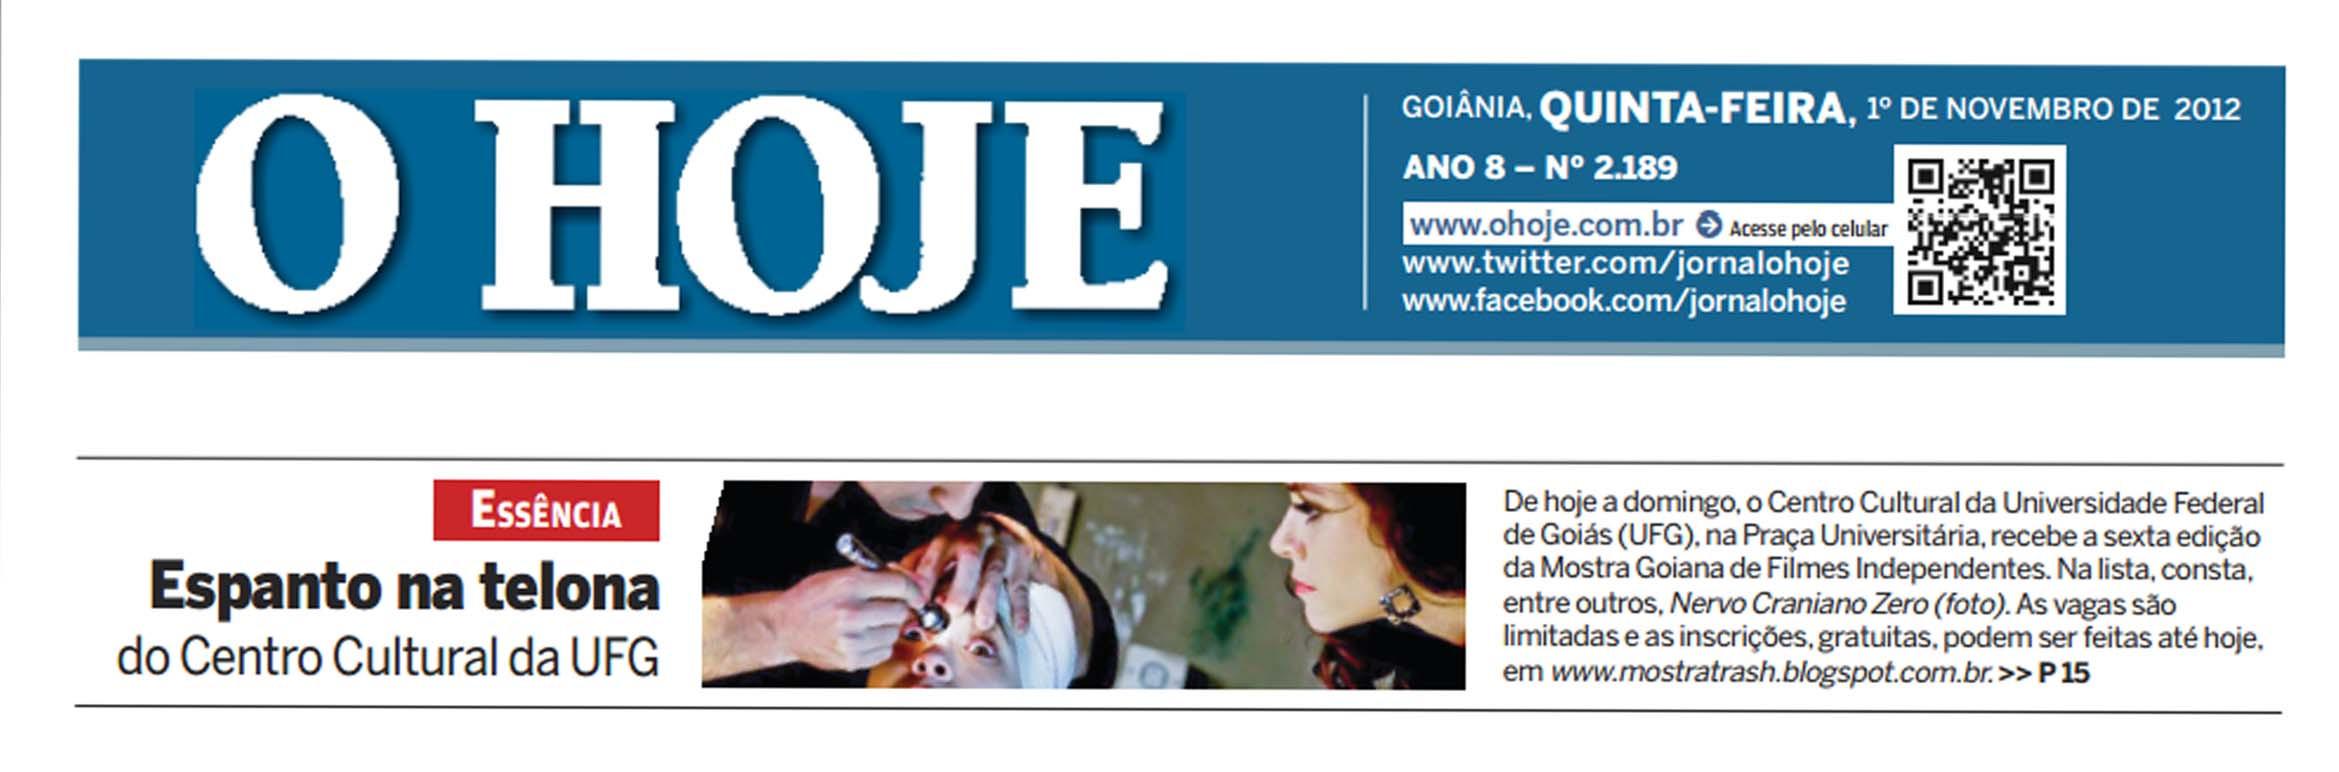 TRASH - Jornal O Hoje (chamada de capa) - 2 de novembro de 2012